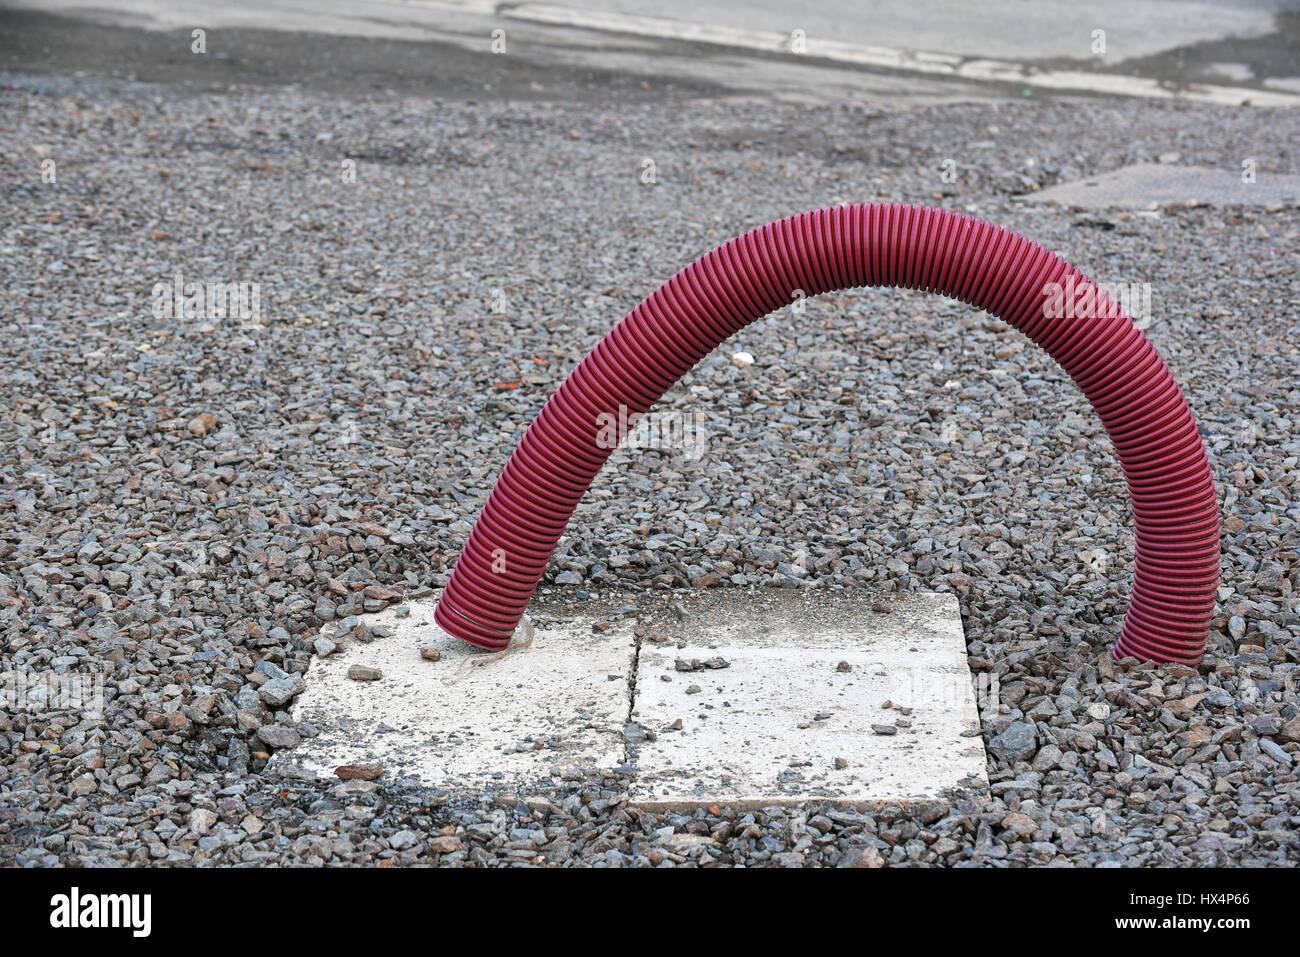 Flexible PVC hose - Stock Image